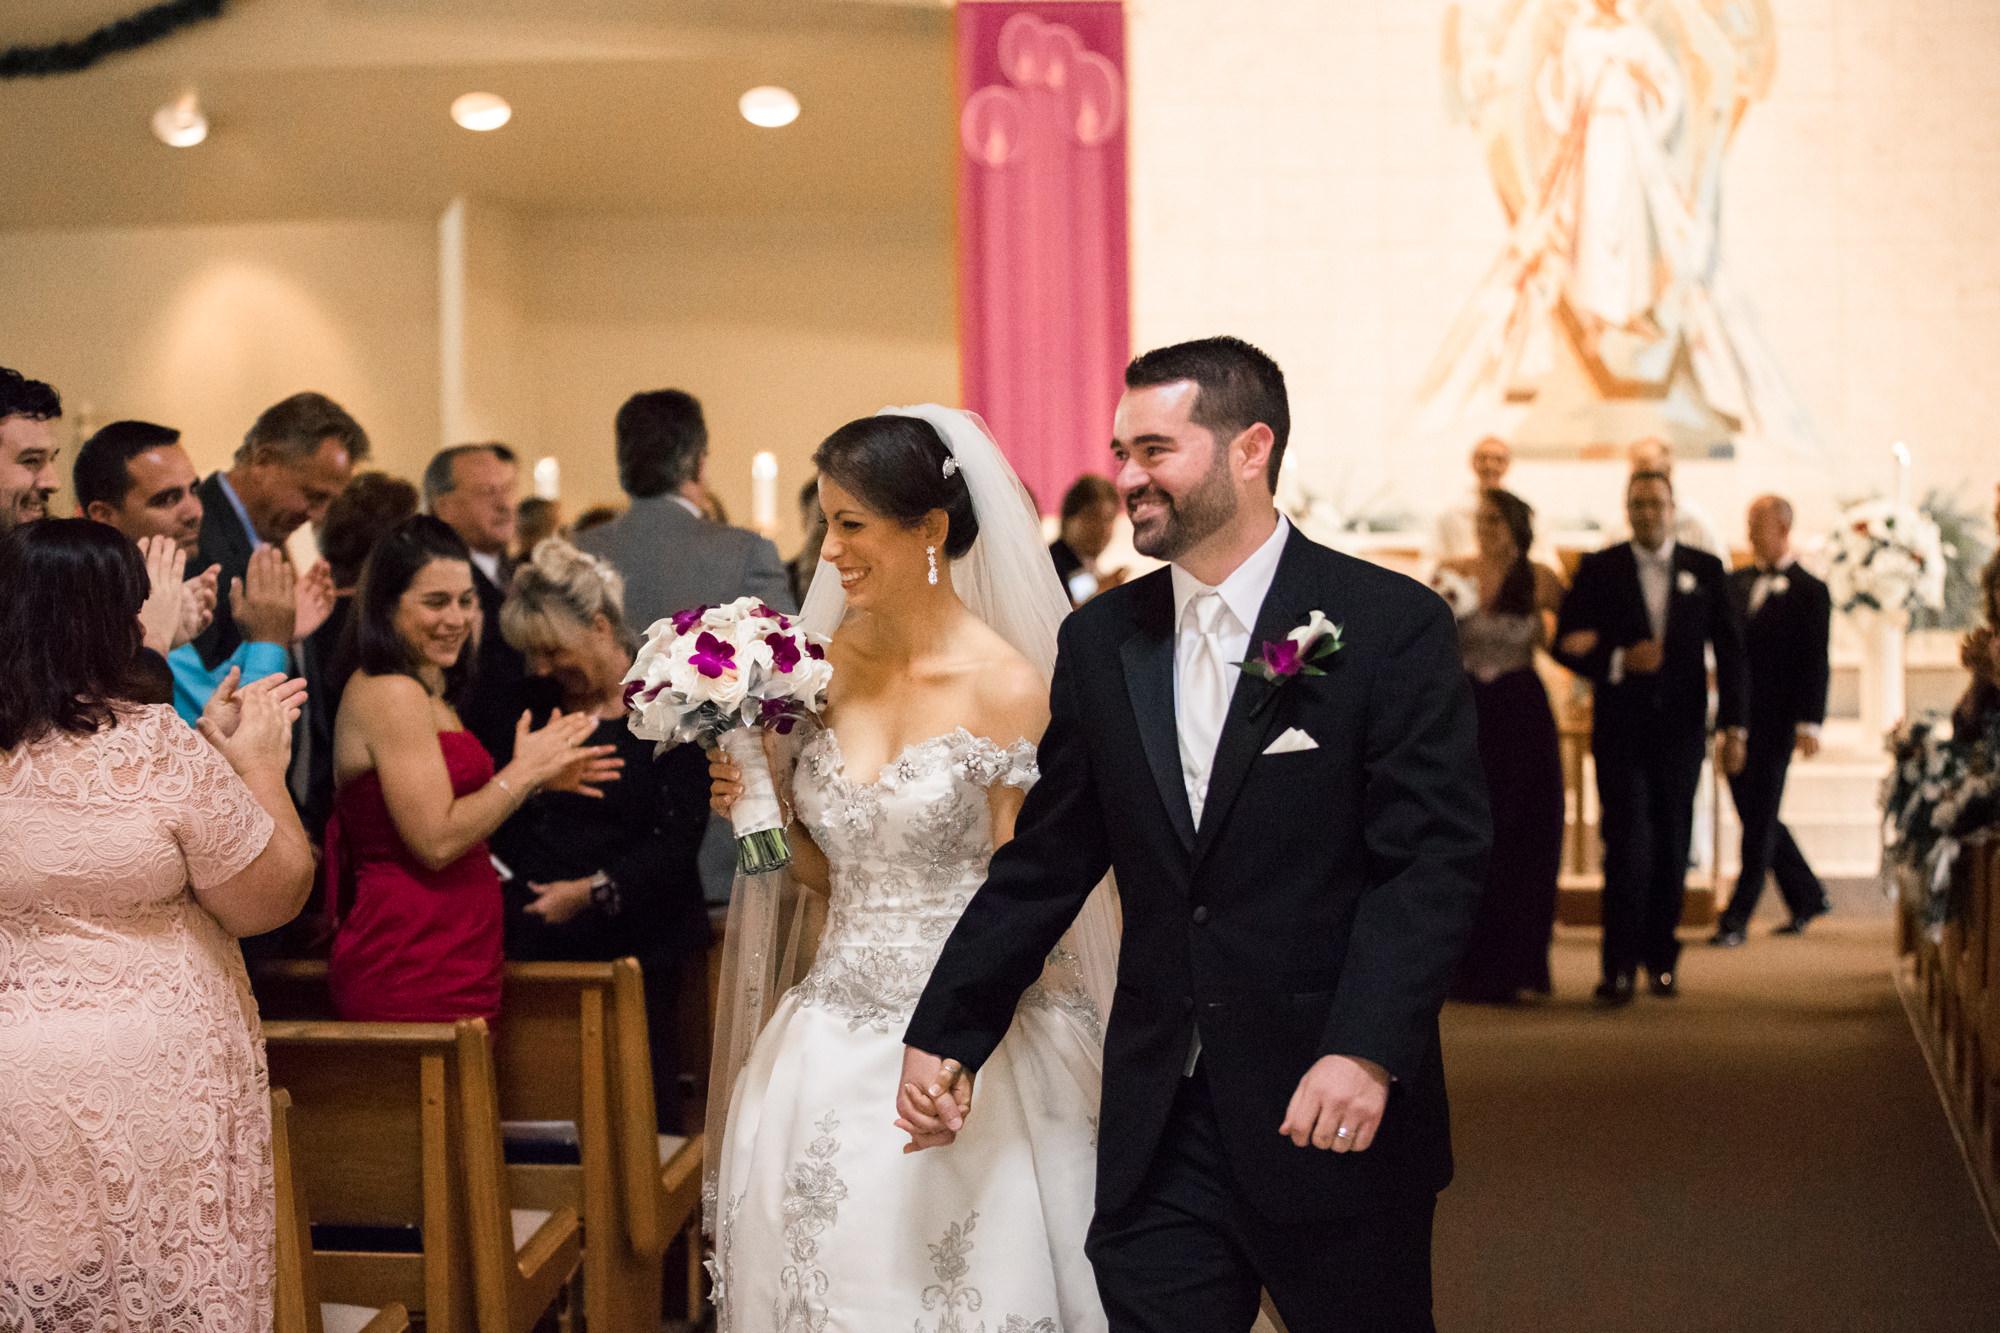 Benvenuto_Wedding_catholic_Florida_Bride-Groom-55.jpg